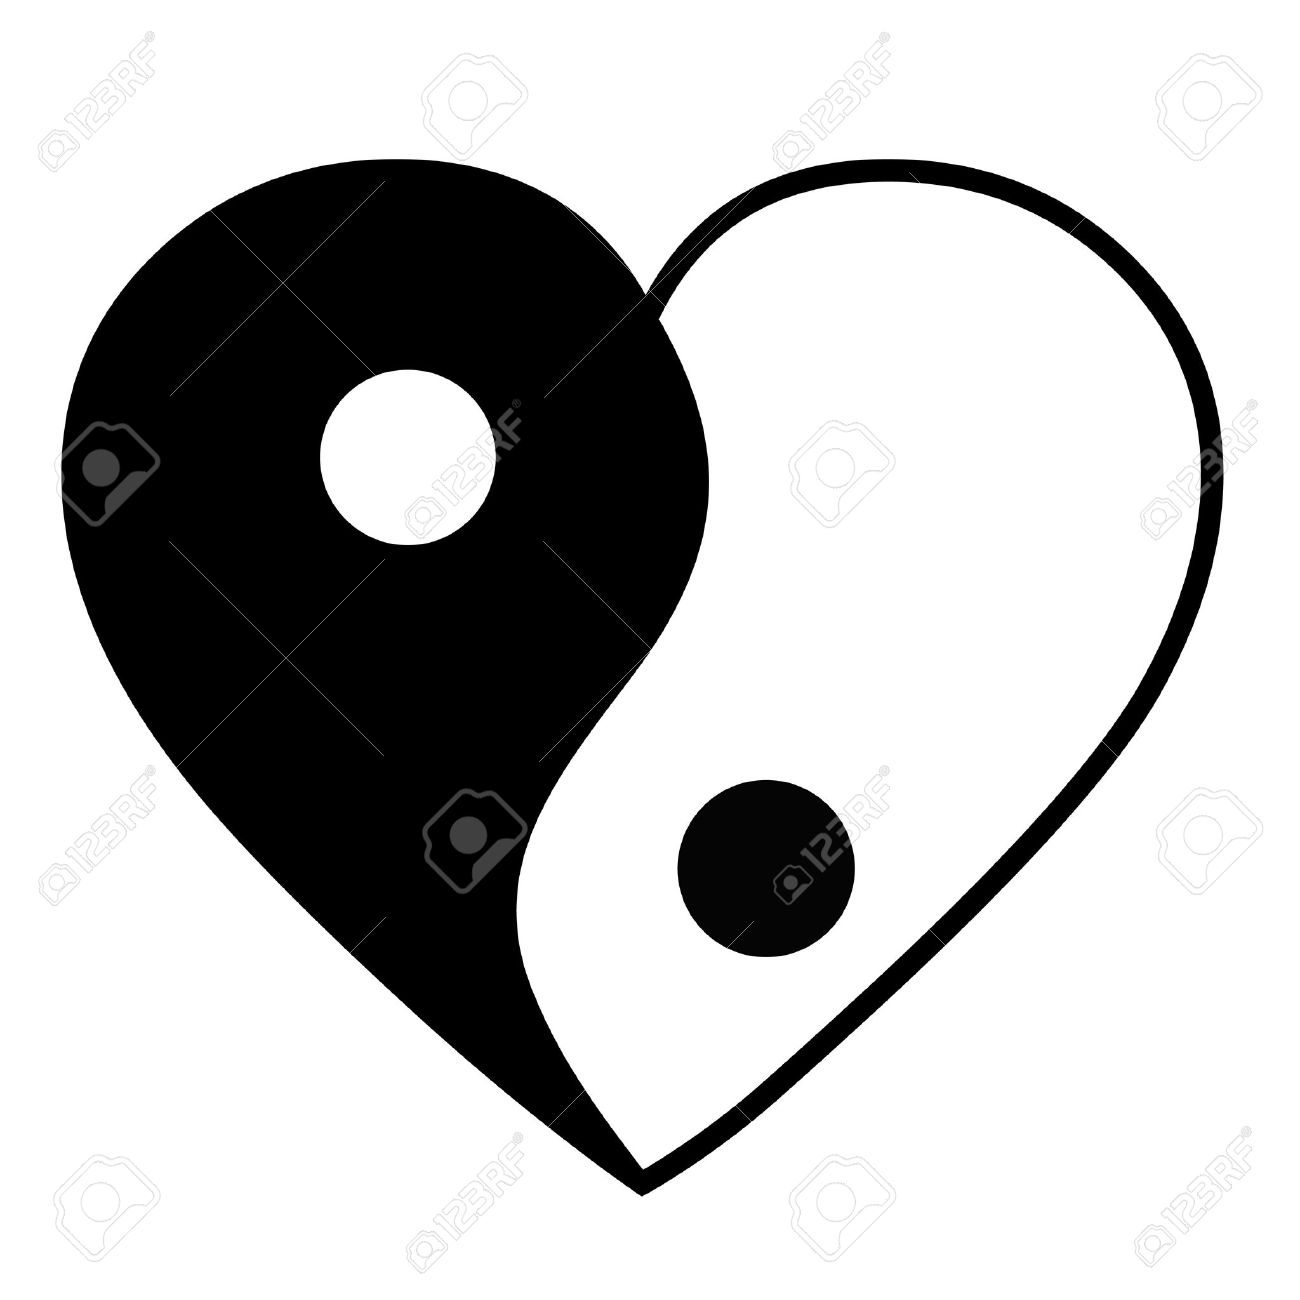 Coeur Yin yang Banque d'images - 25665362